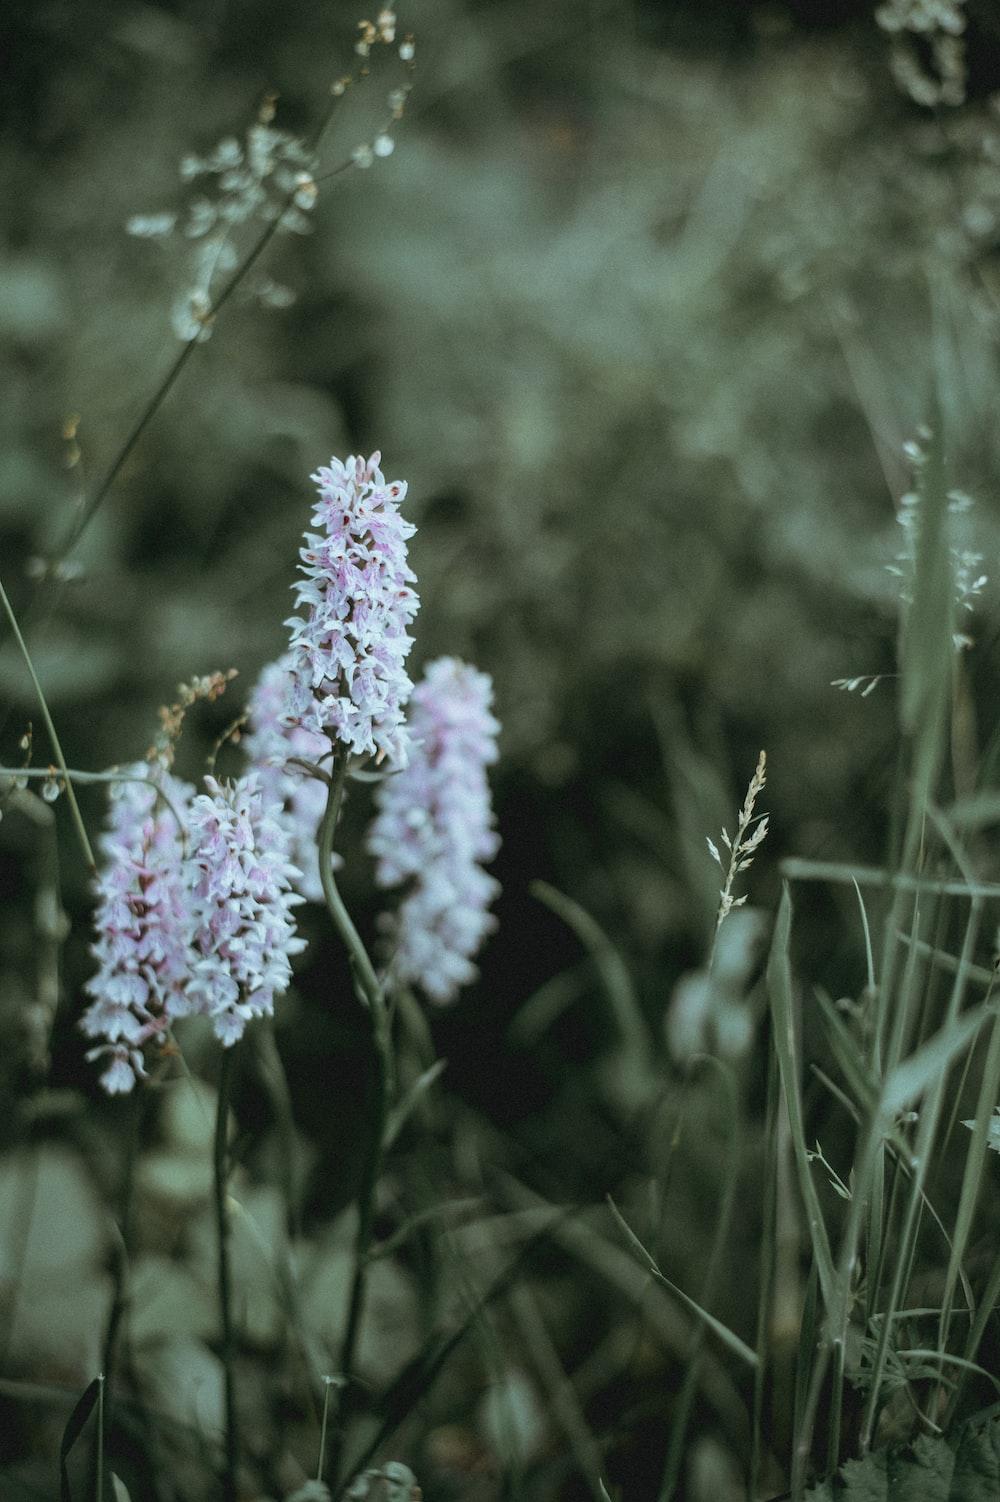 Flower Petals Green And White Hd Photo By Annie Spratt